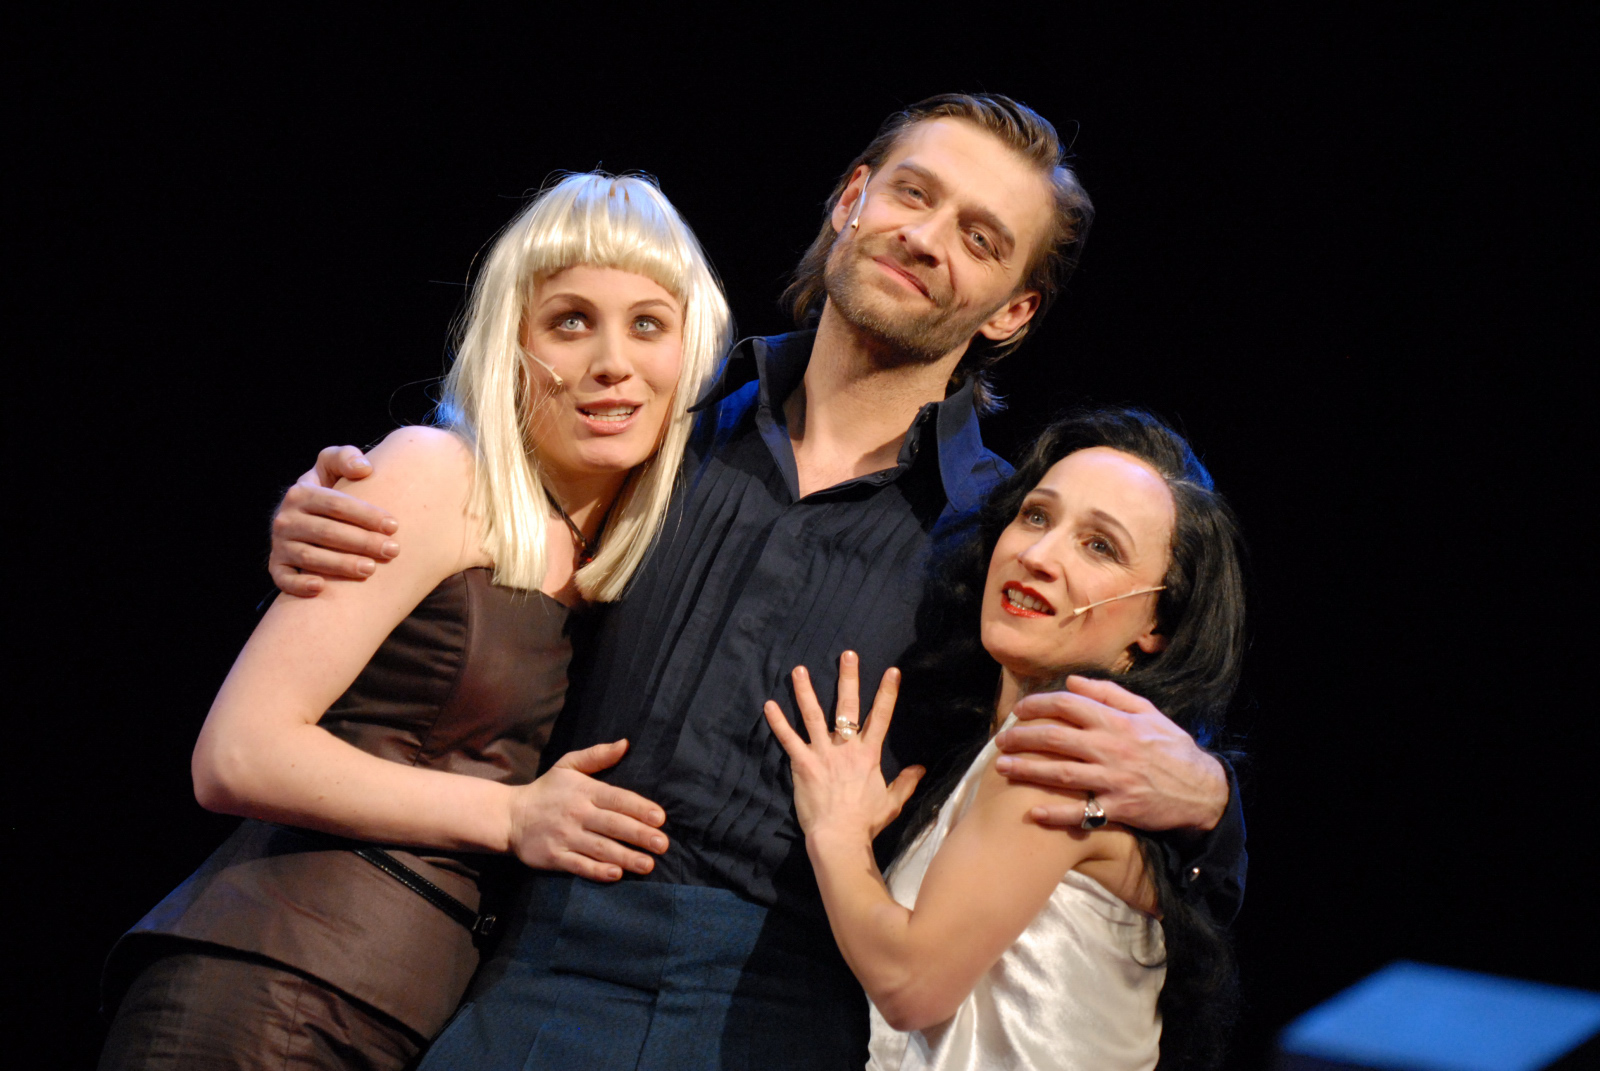 Dreigroschenoper, 2010, Staatstheater Braunschweig, Fotos: Christian Bort